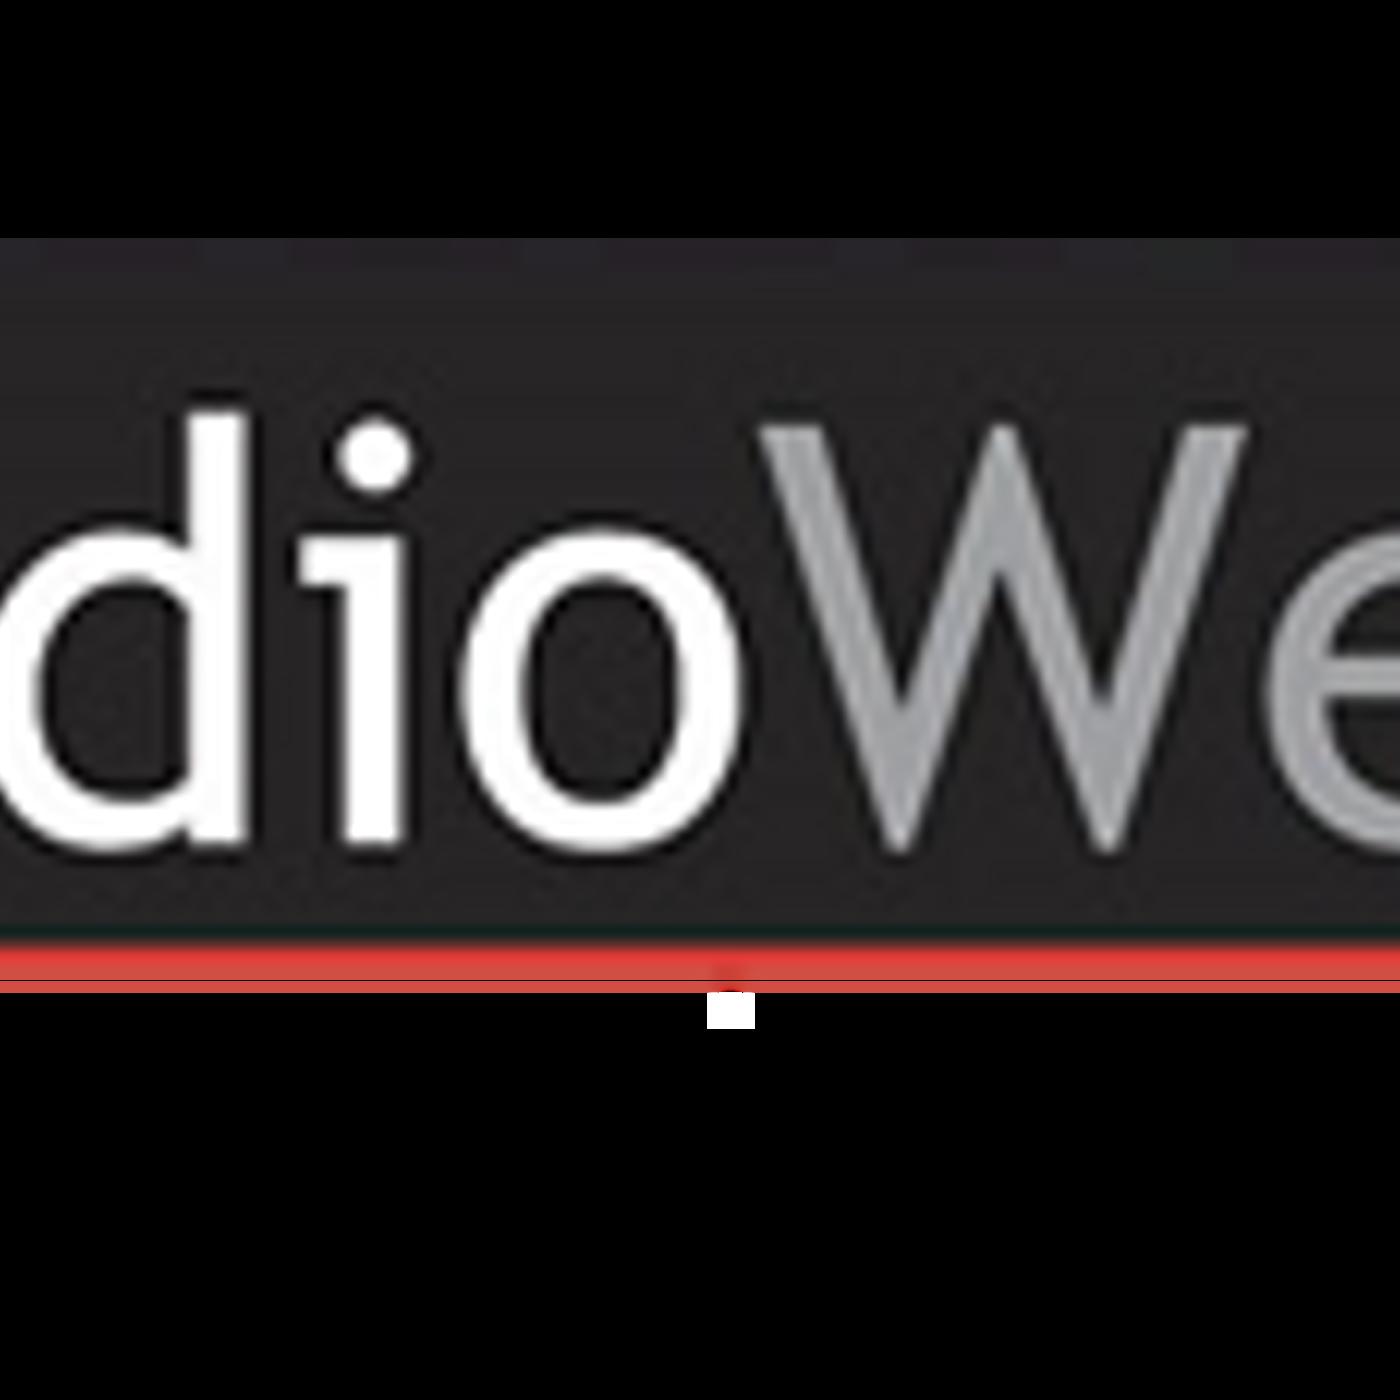 Hgpktxwqvwmkchfidg2r radiowest new